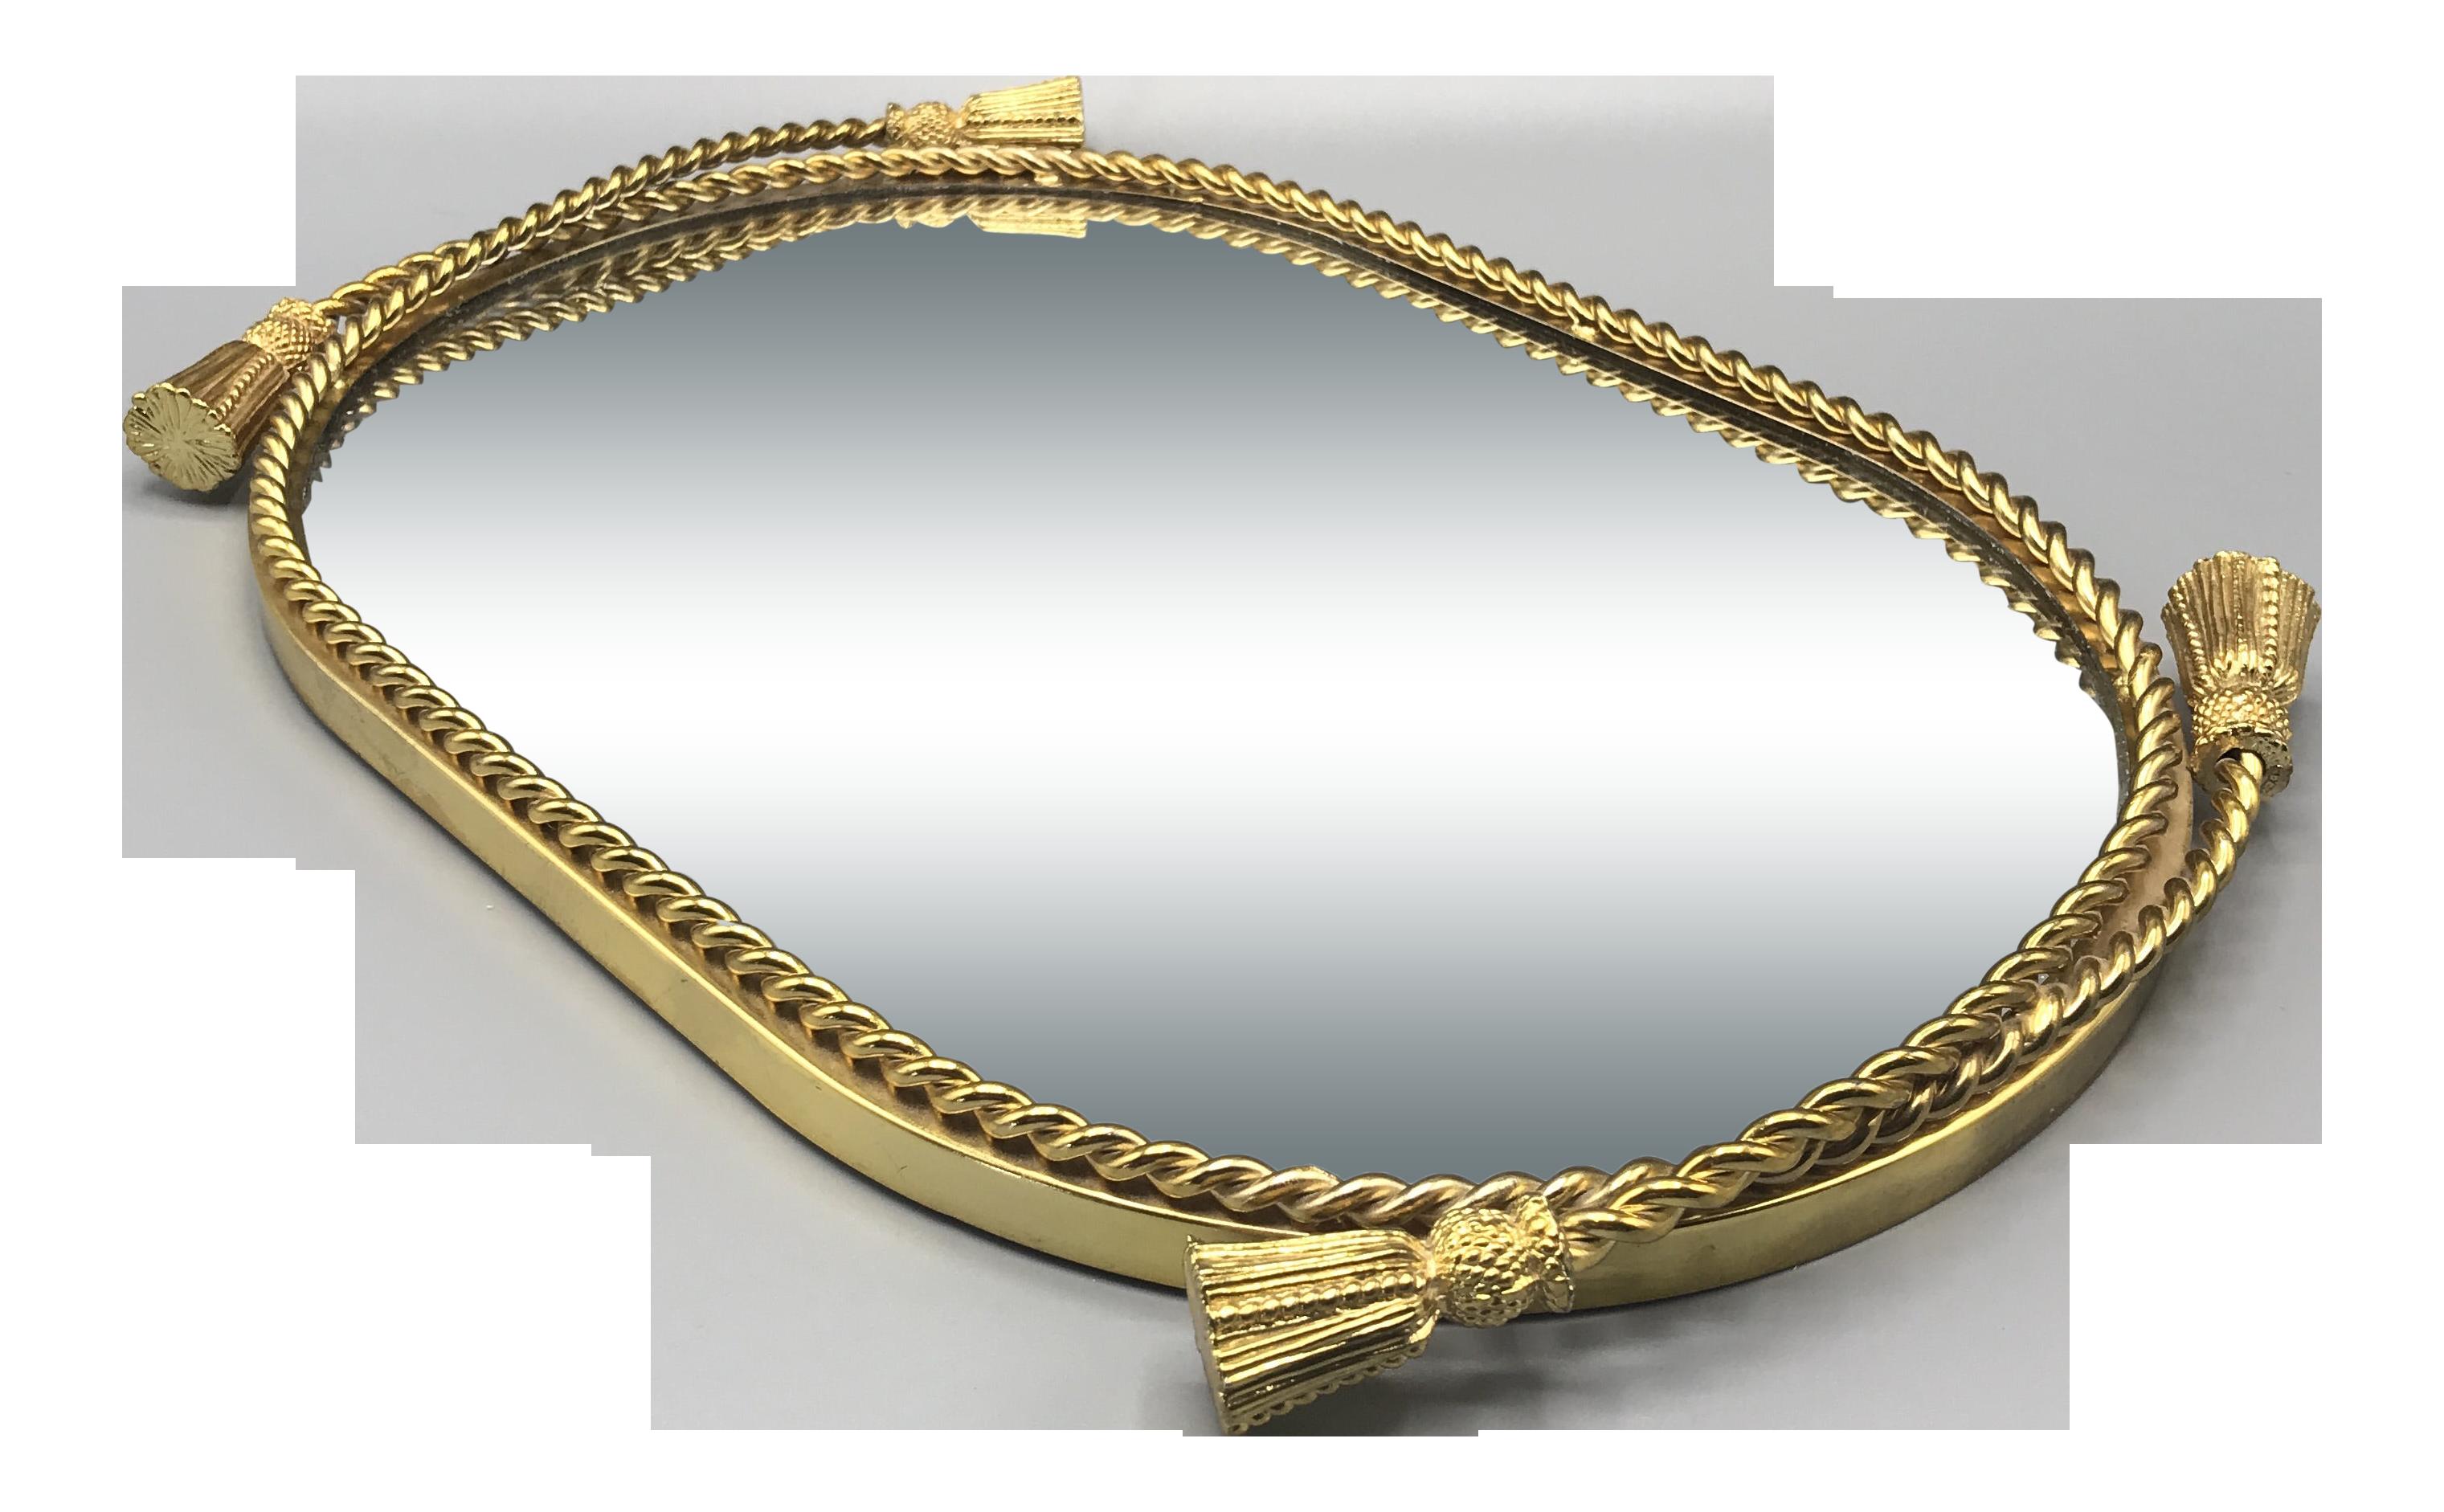 Vintage Godinger Silver Art Company Ltd Gold Tassel Dresser Mirror Tray Chairish